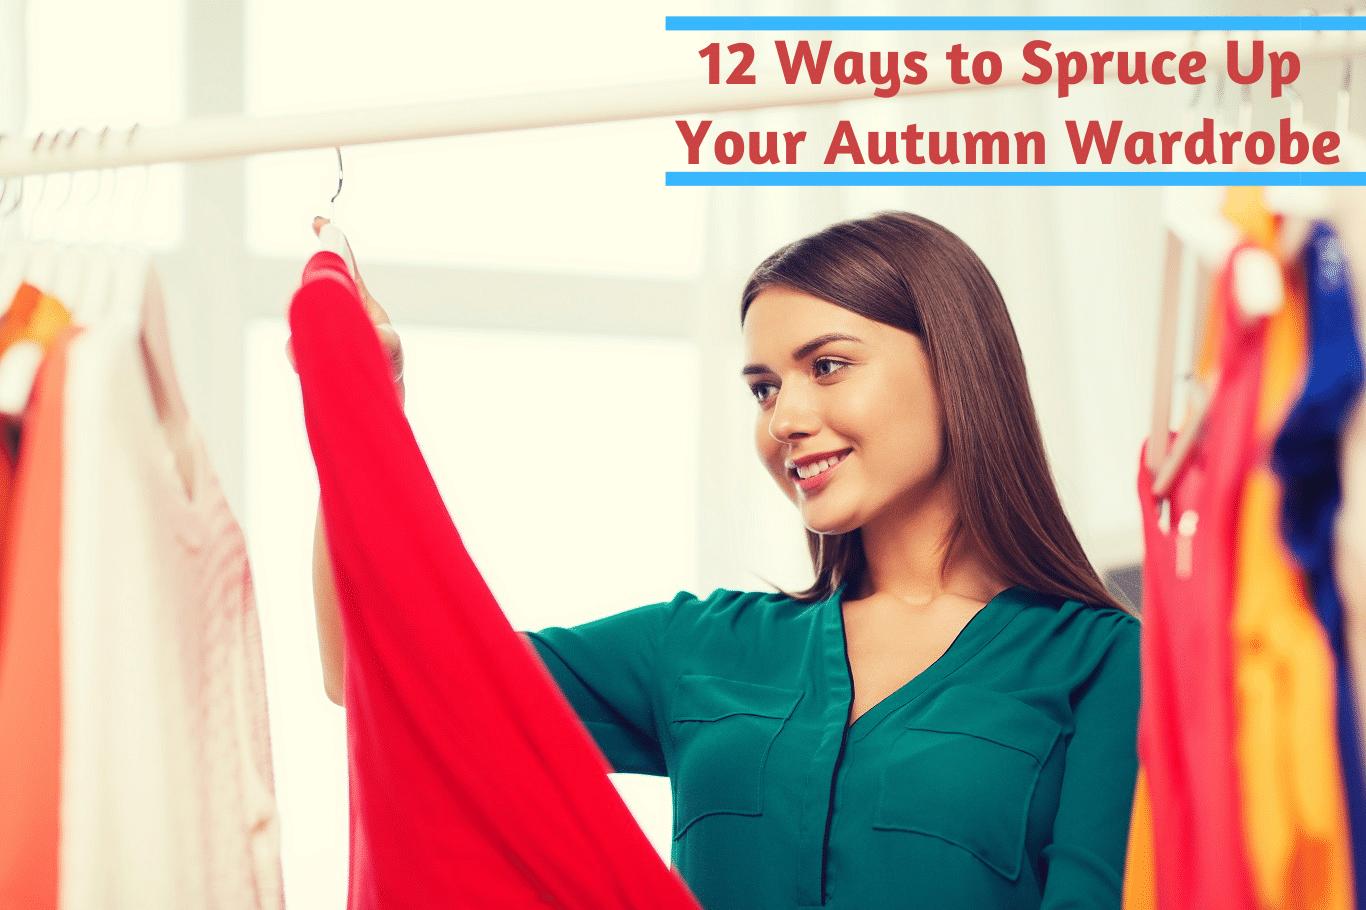 12 Ways to Spruce Up Your Autumn Wardrobe